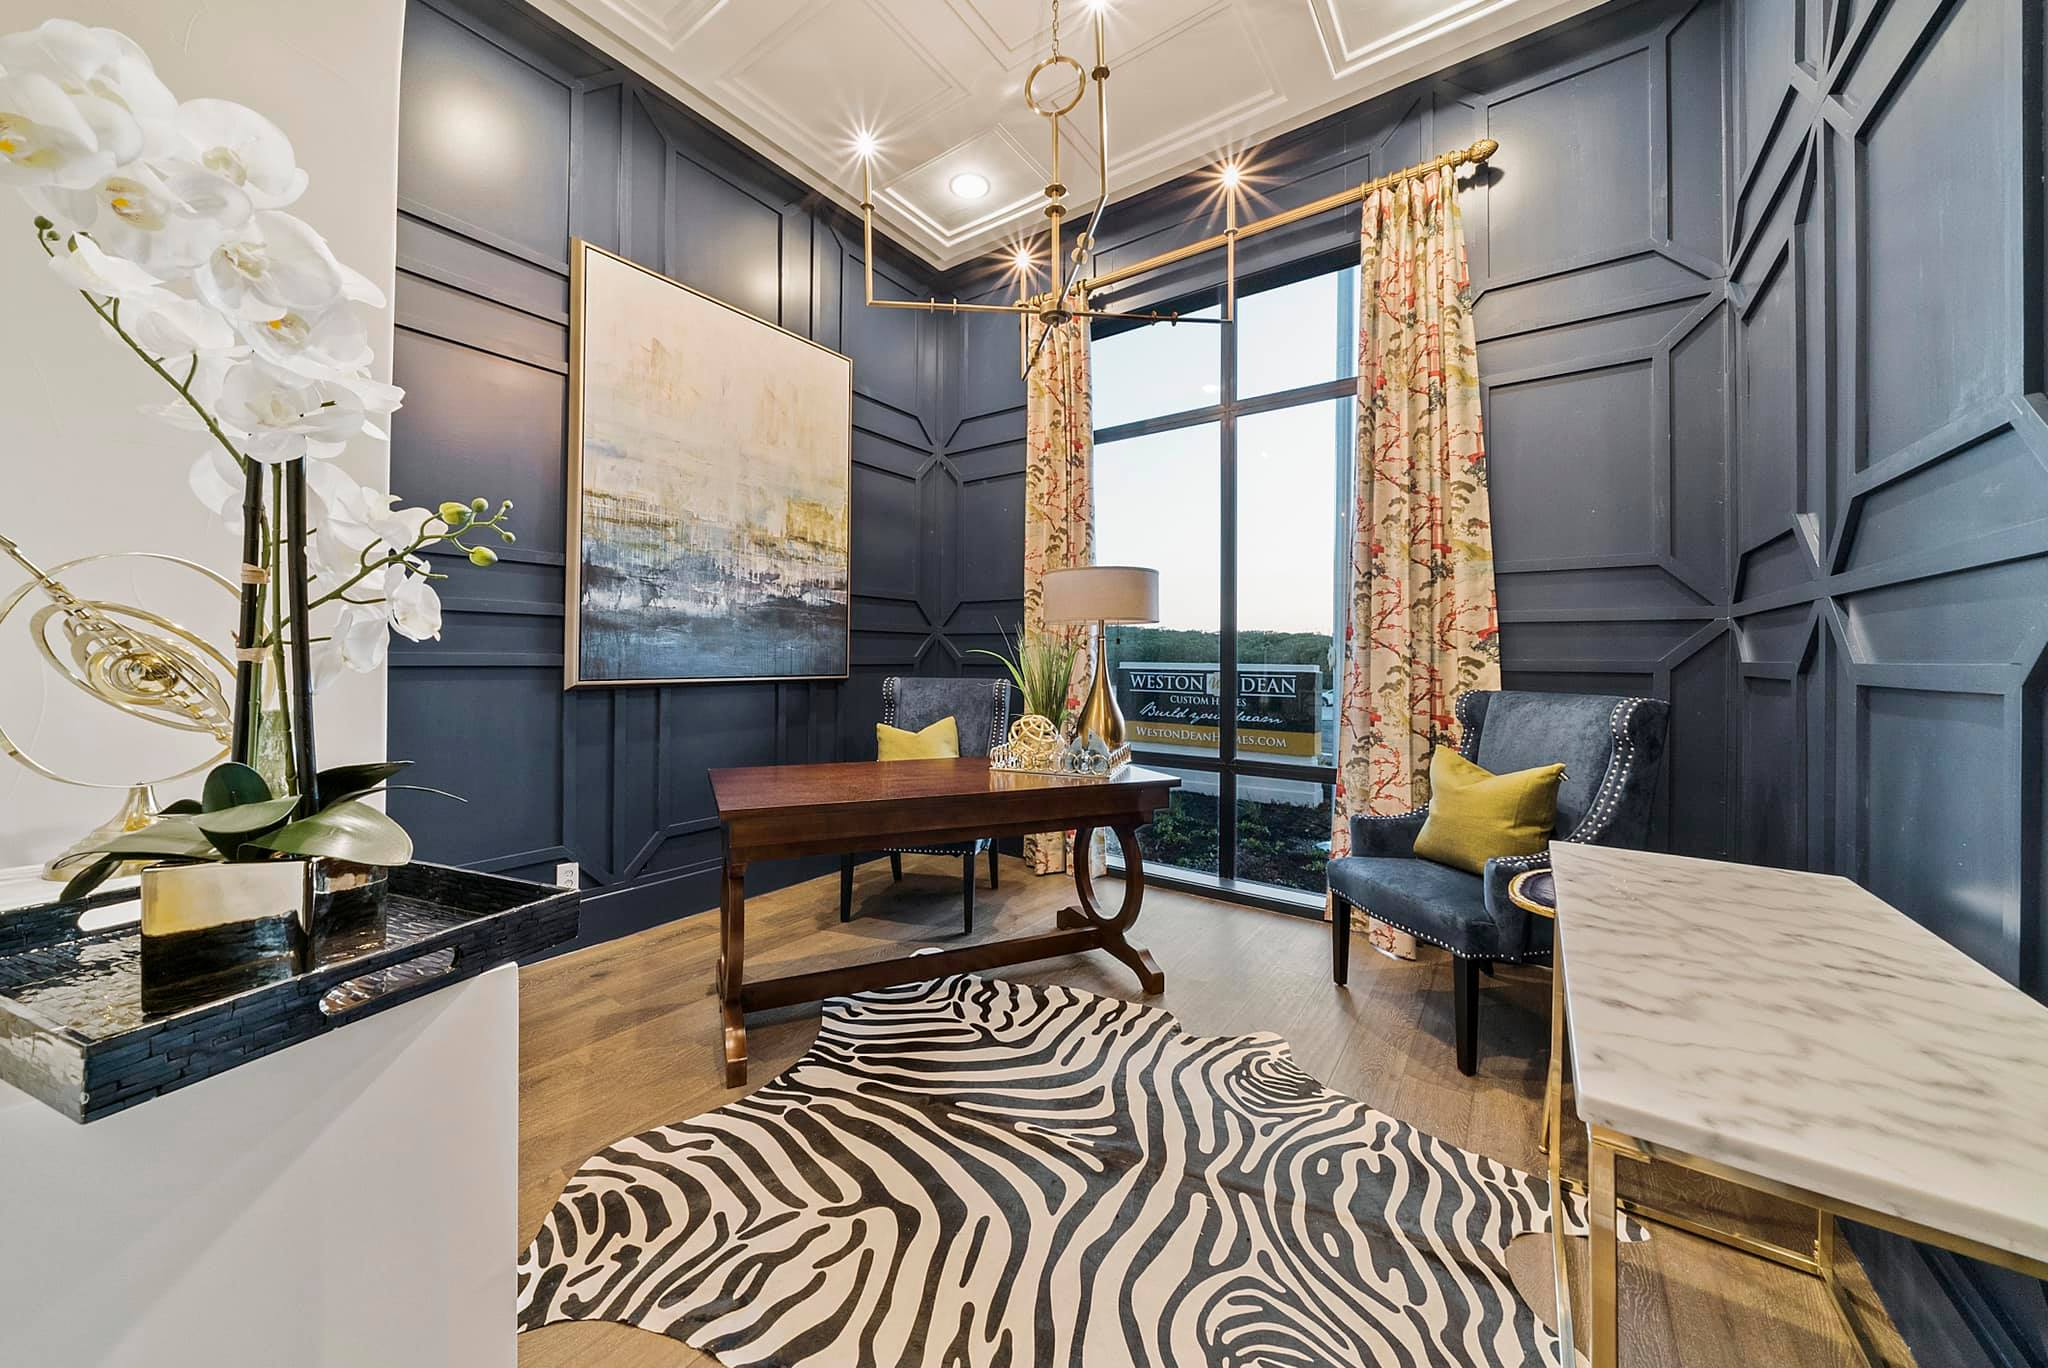 Custom home study with unique design choices